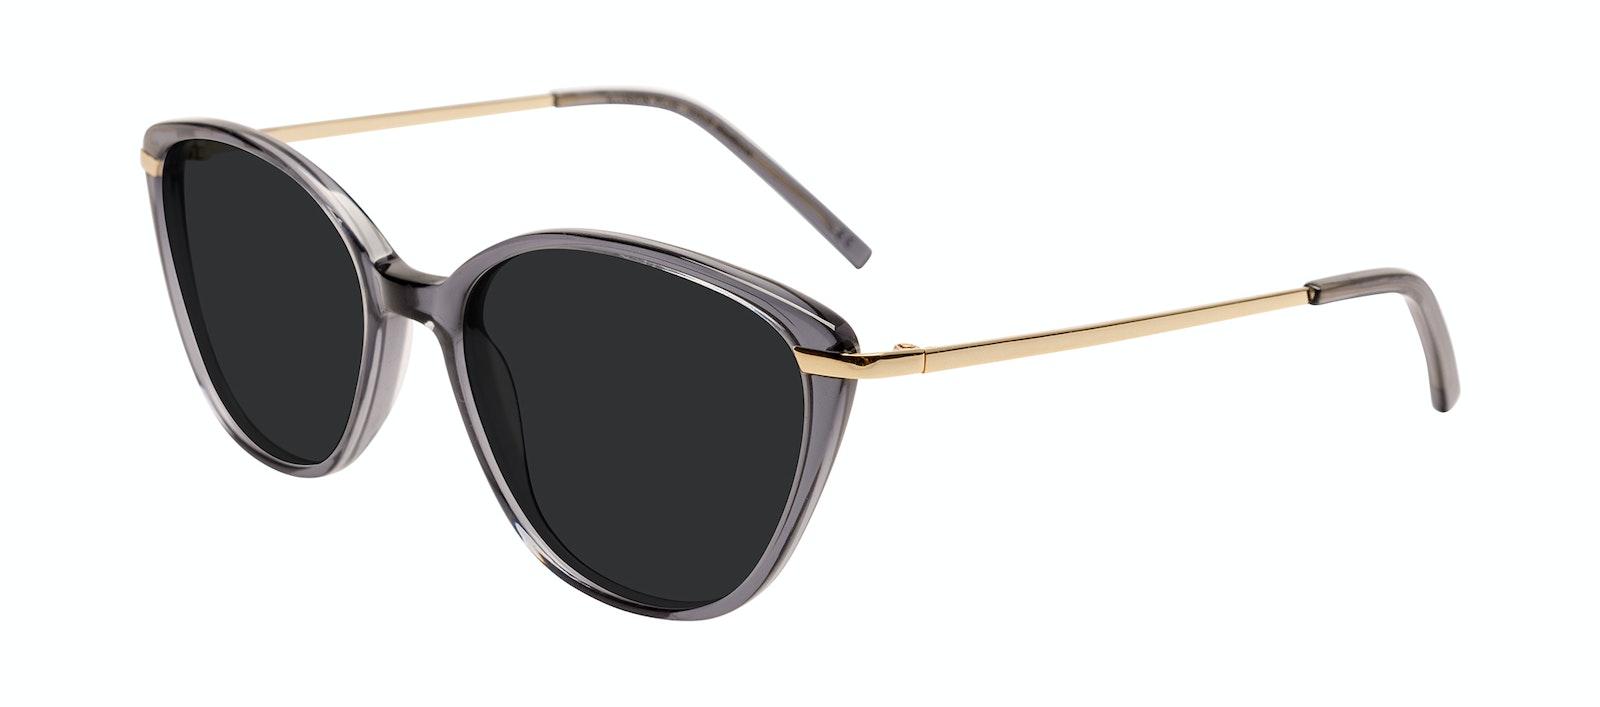 Affordable Fashion Glasses Cat Eye Sunglasses Women Illusion Plus Gold Shadow Tilt